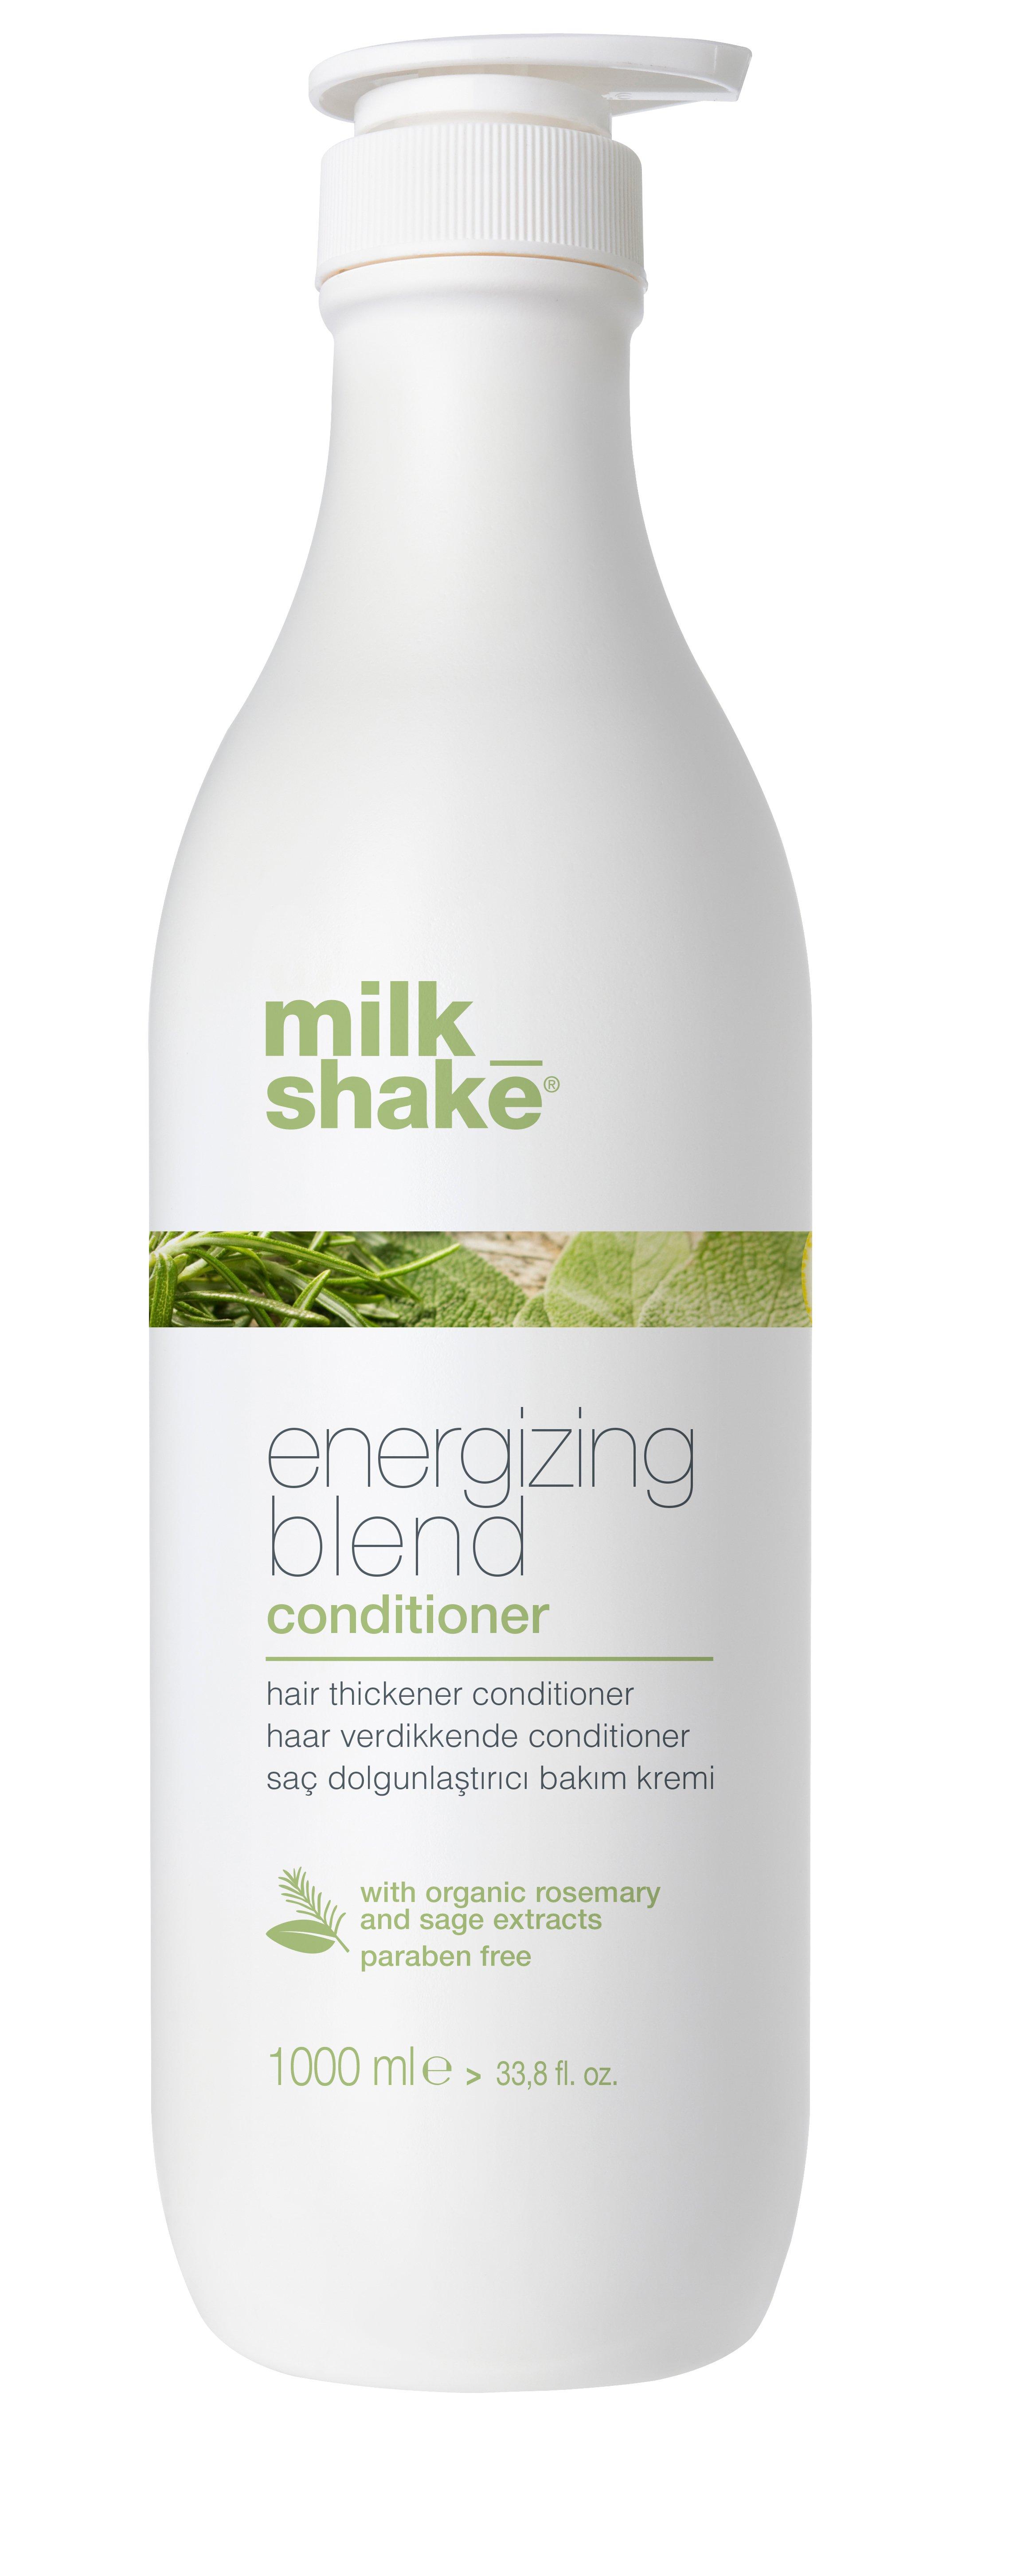 milk_shake - Energizing Conditioner 1000 ml